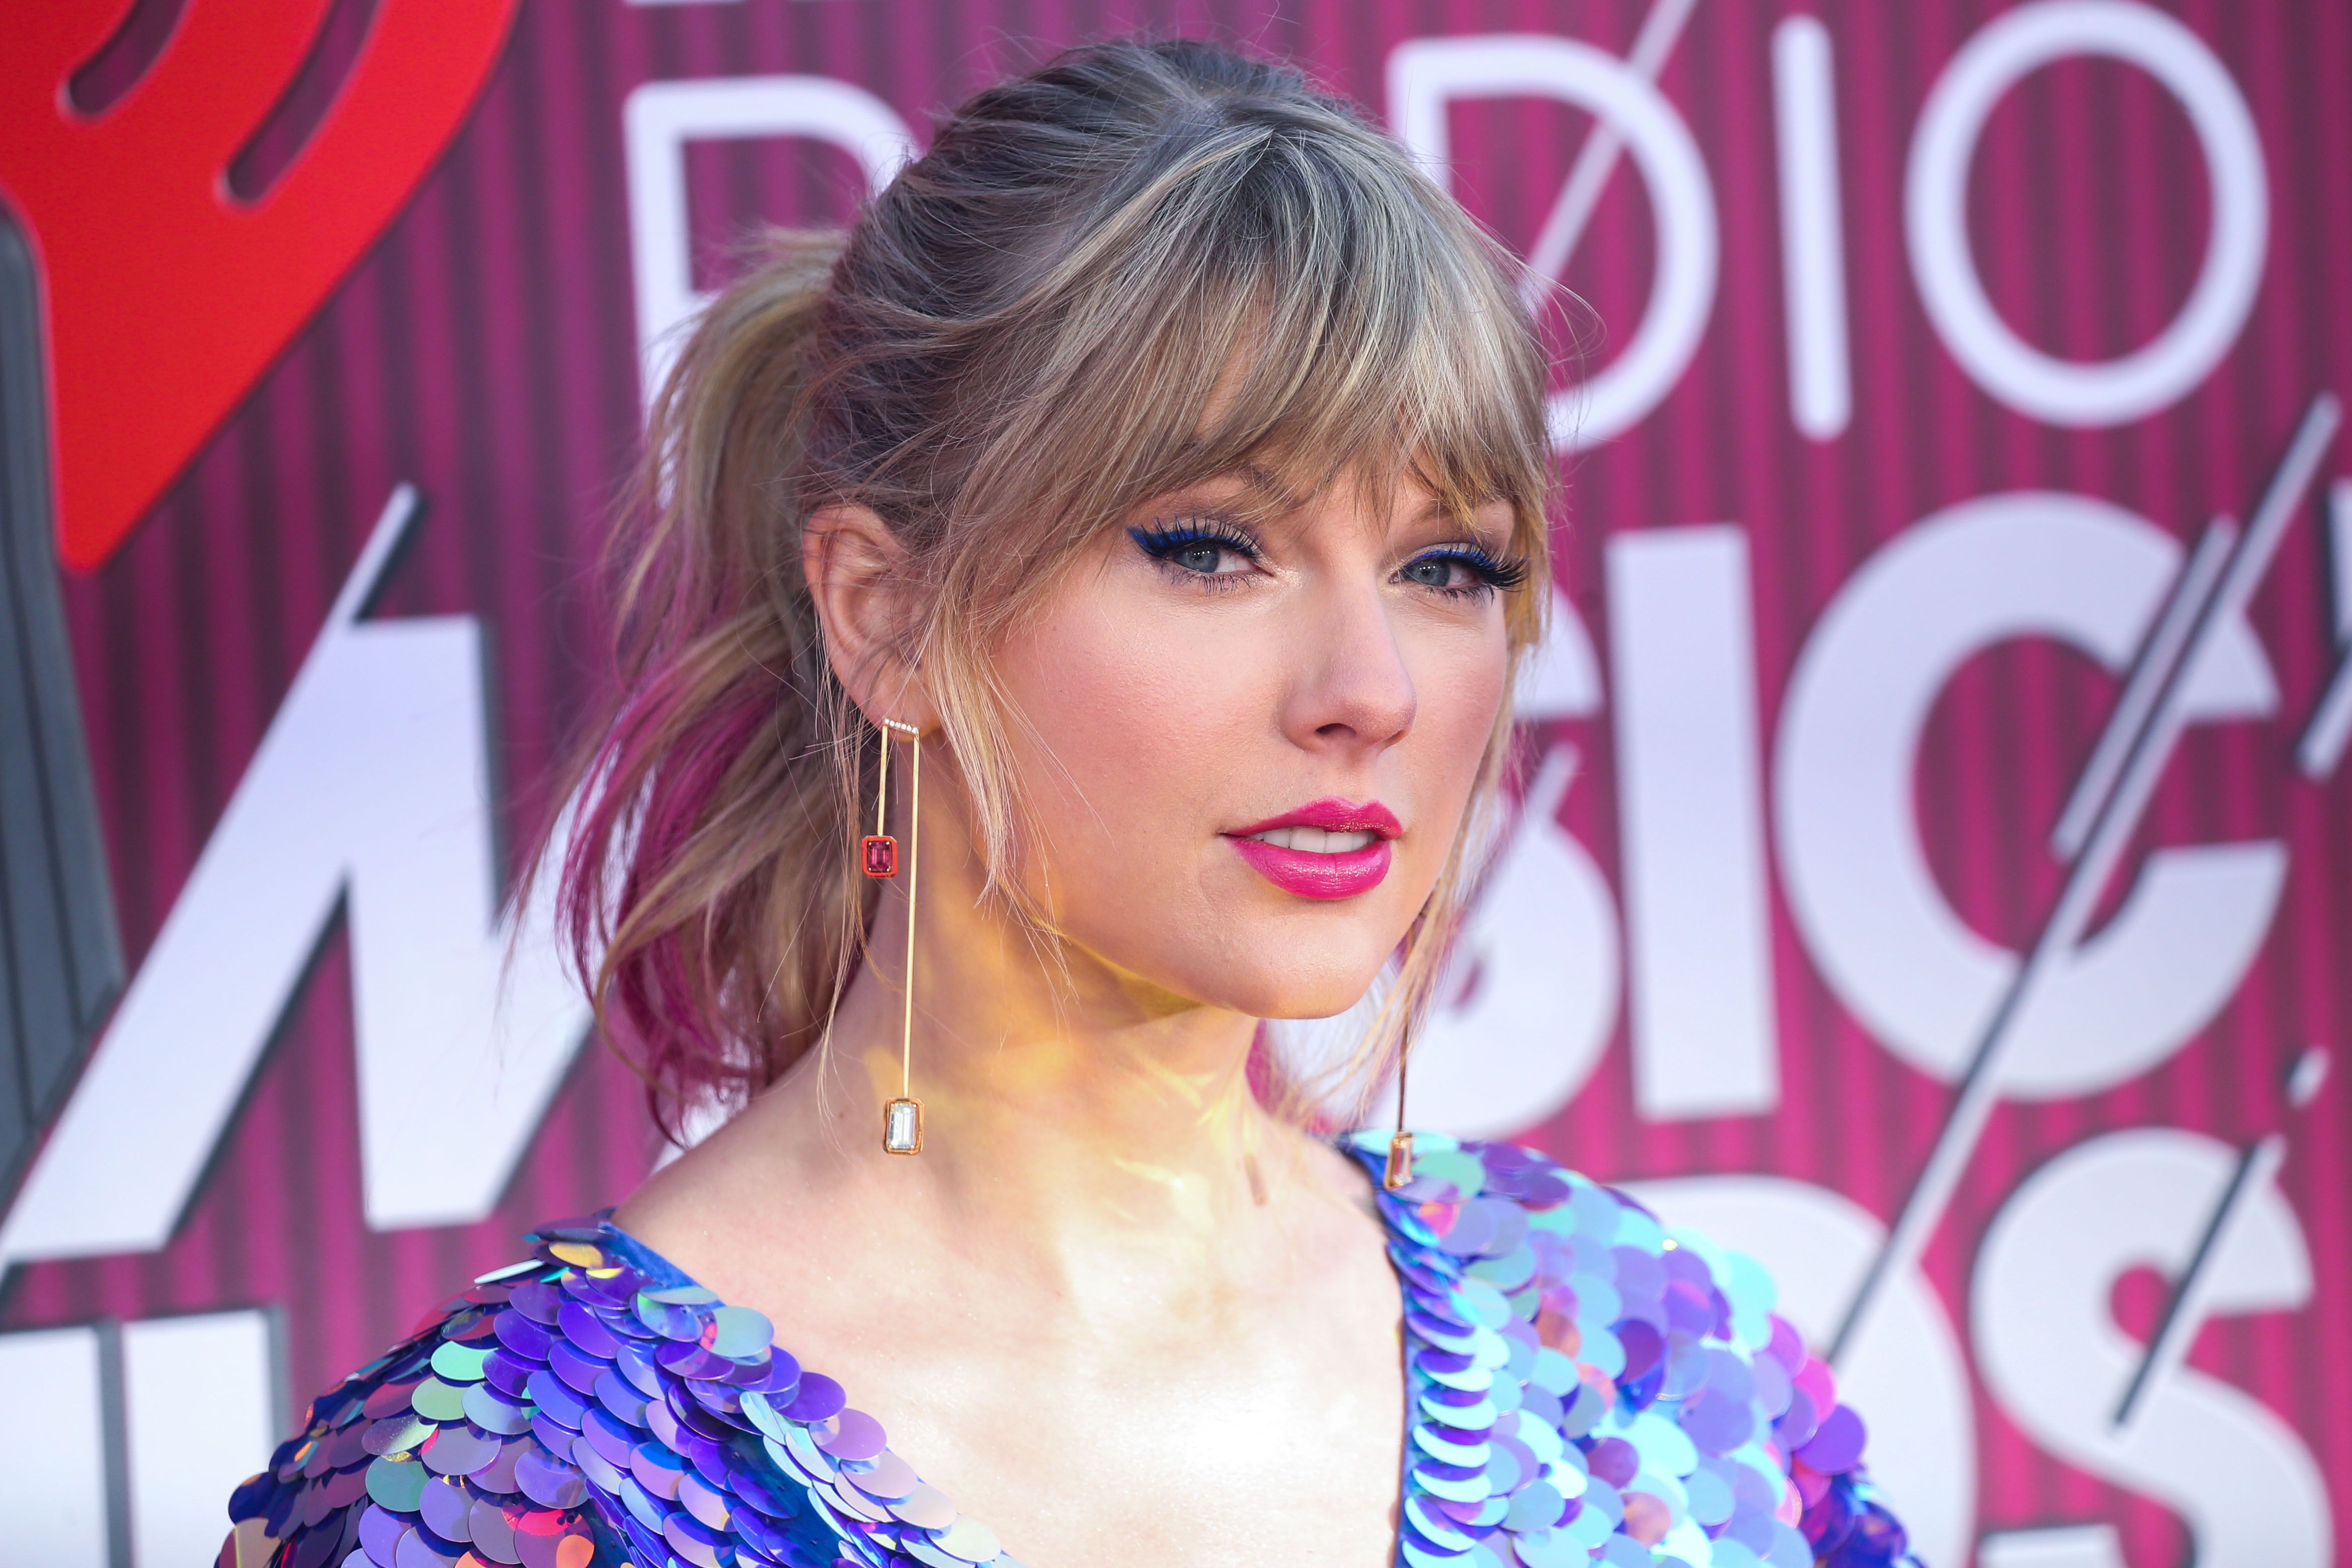 Taylor Swift Pink Hair 2019 Taylor Swift Pink Hair Iheartradio Music Awards